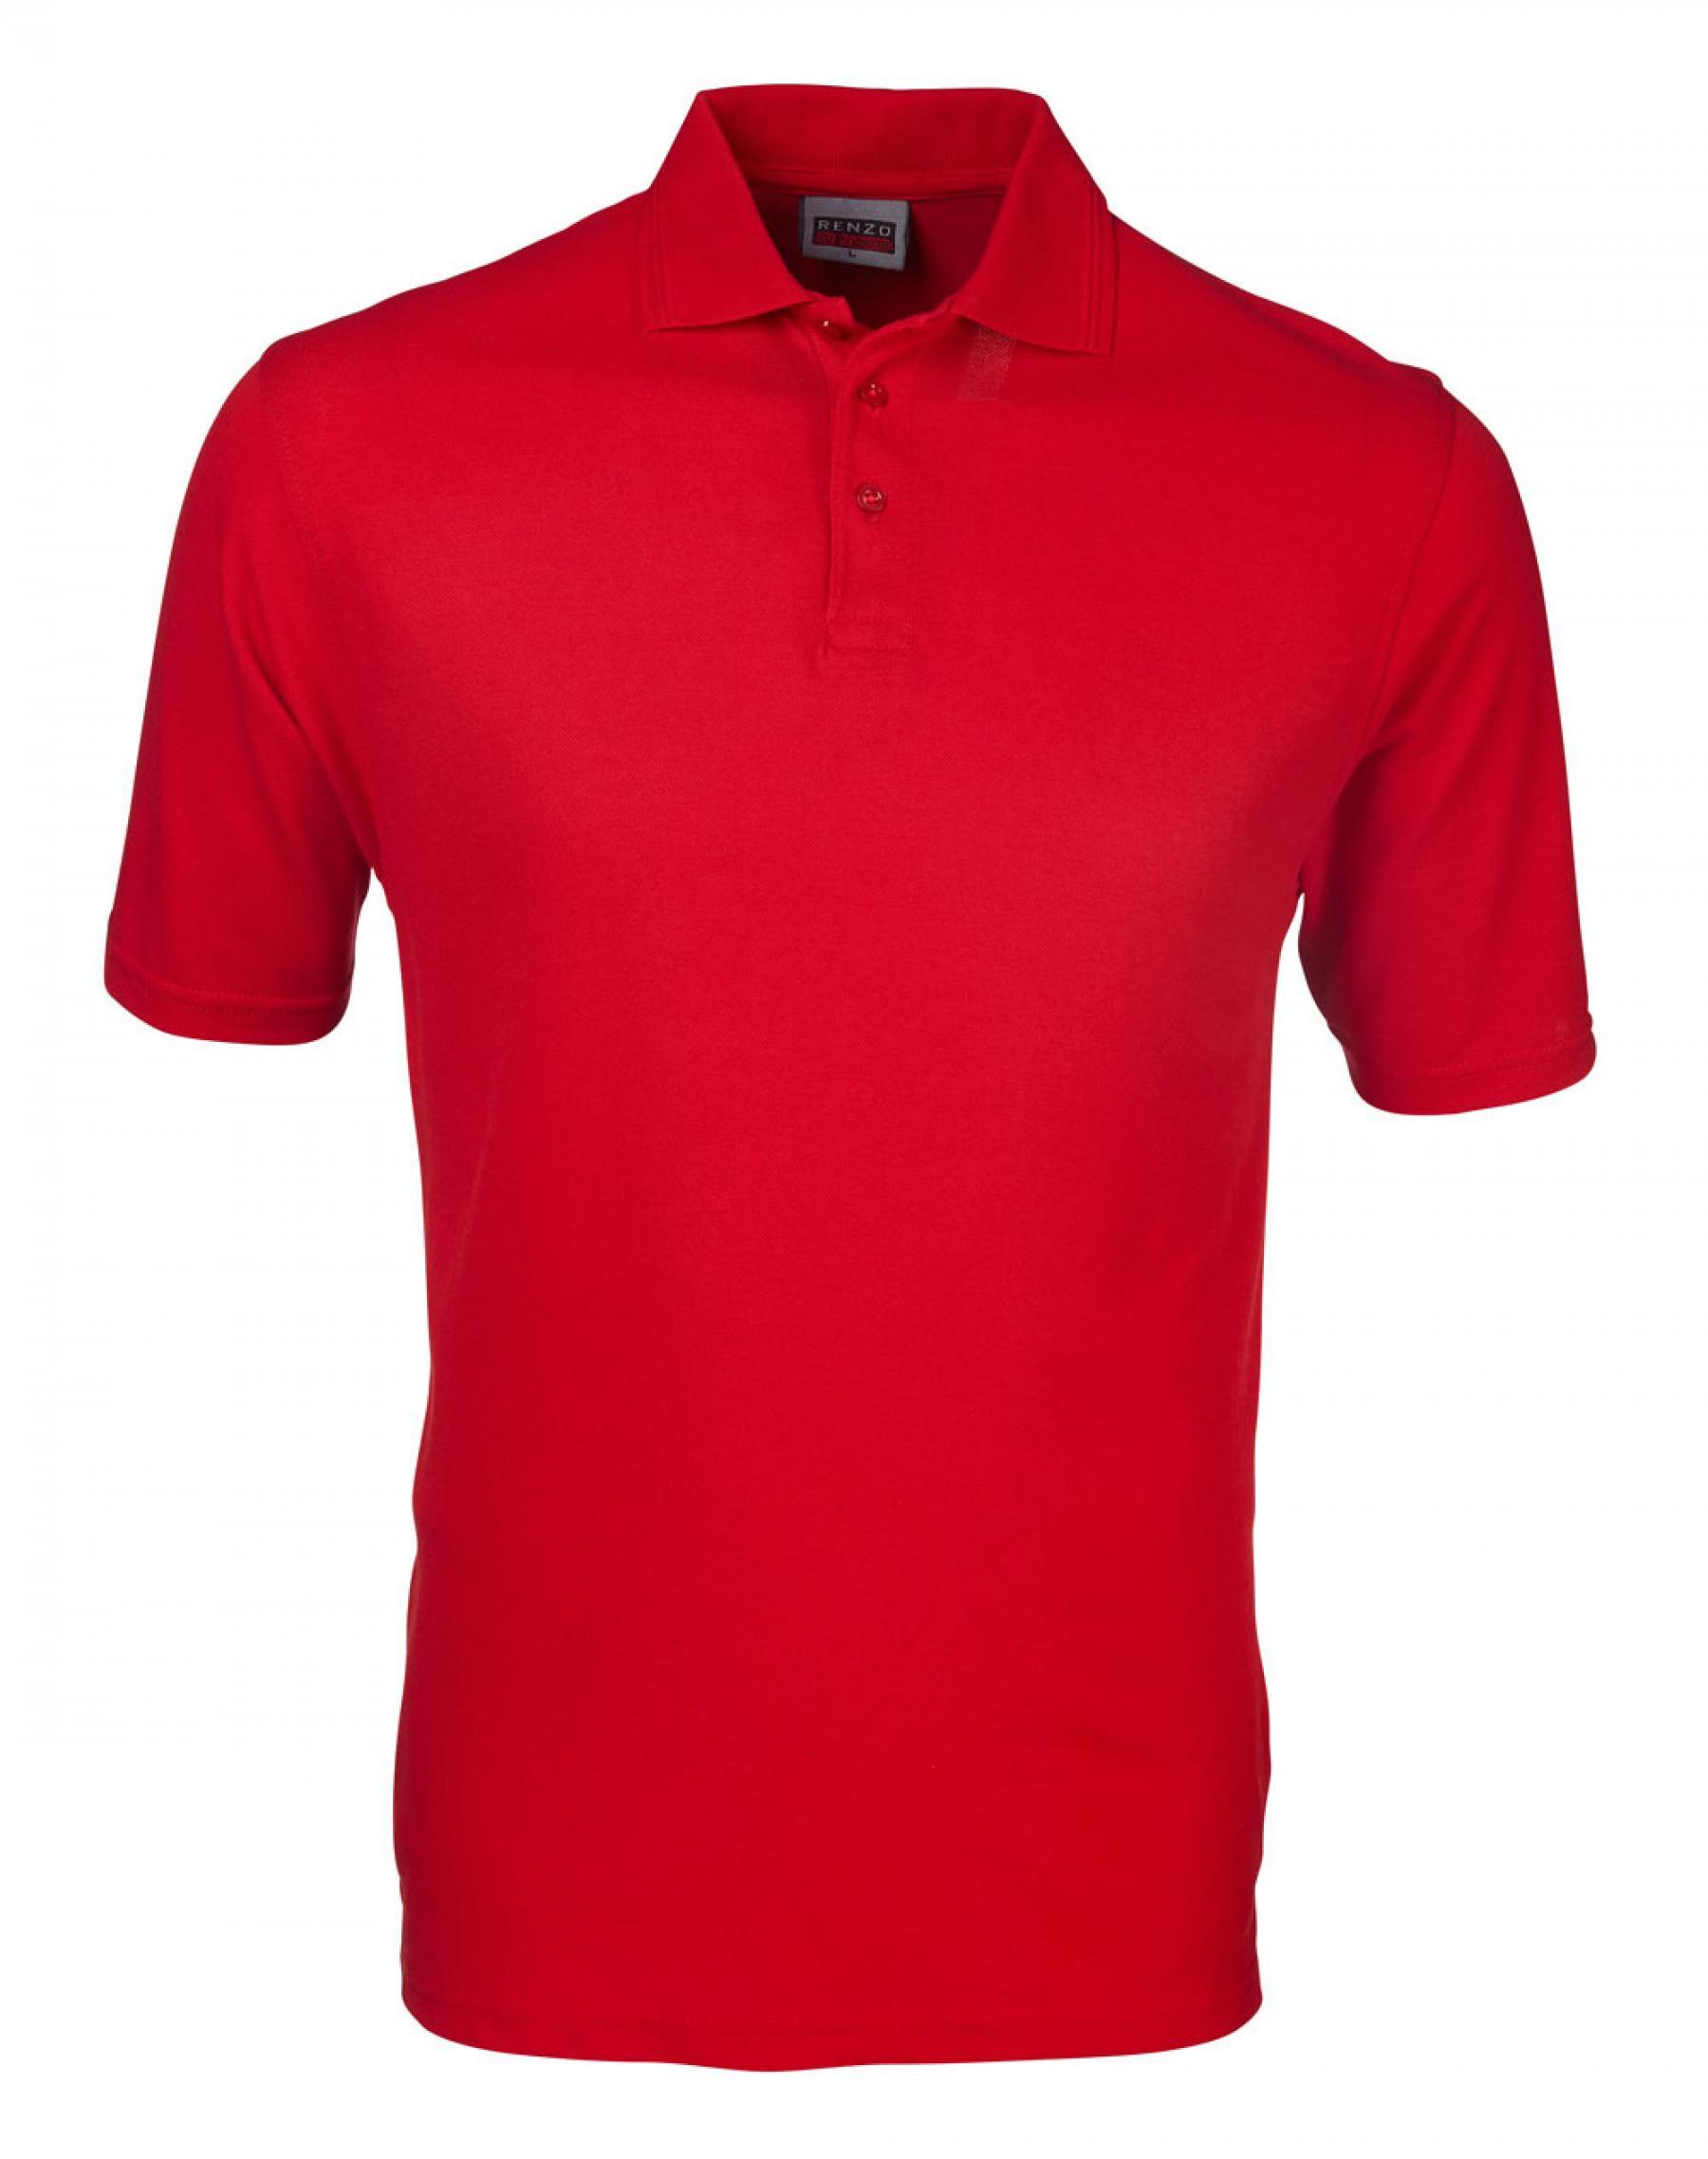 P18 Pique Golfer - Pillar Box Red